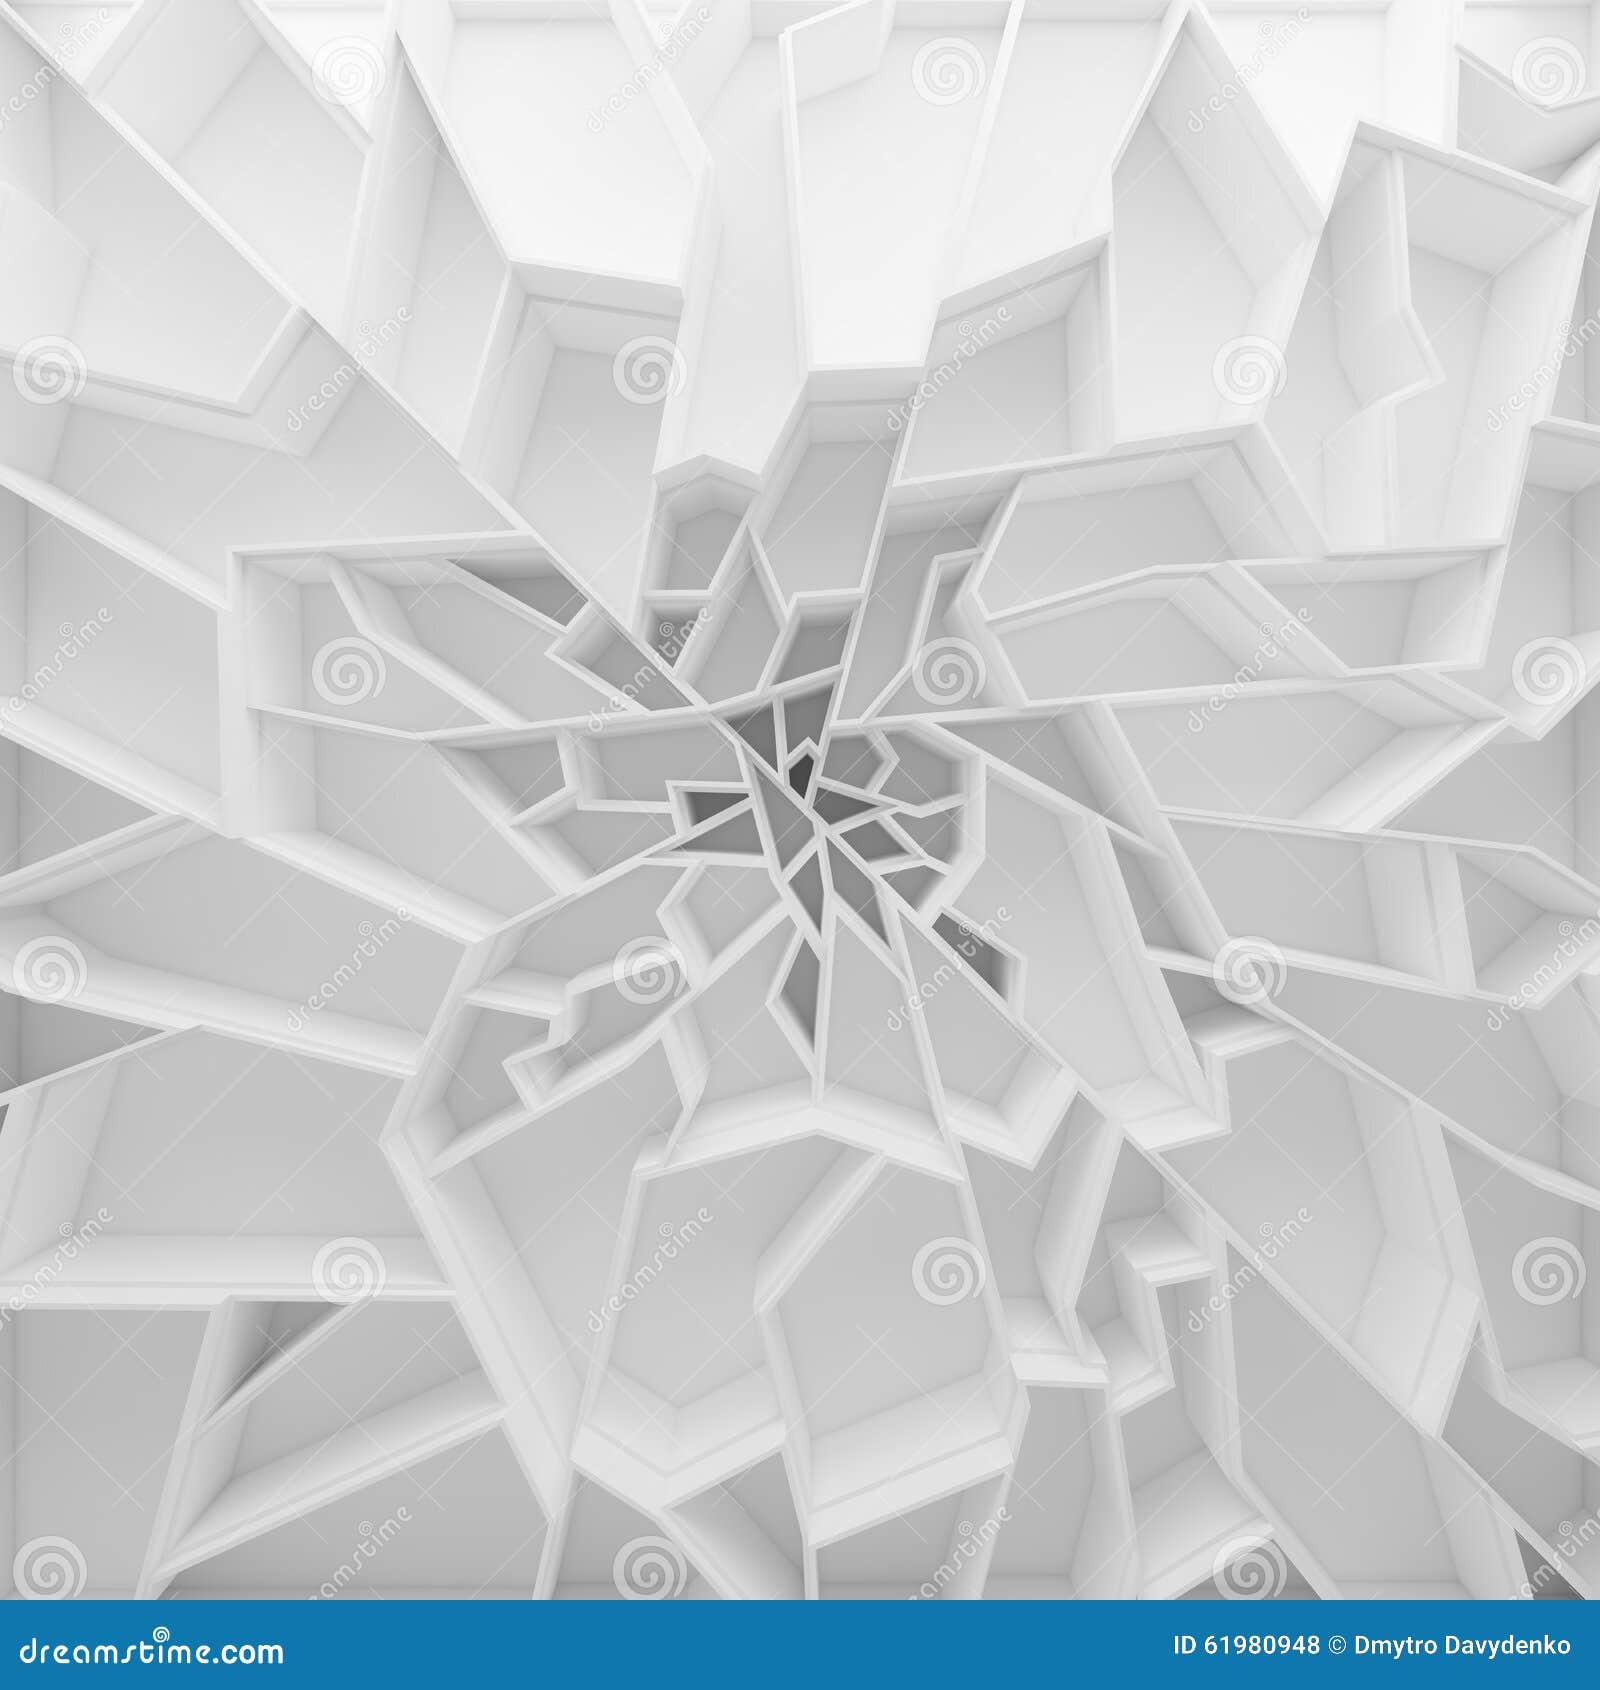 abstract wallpaper interior - photo #9